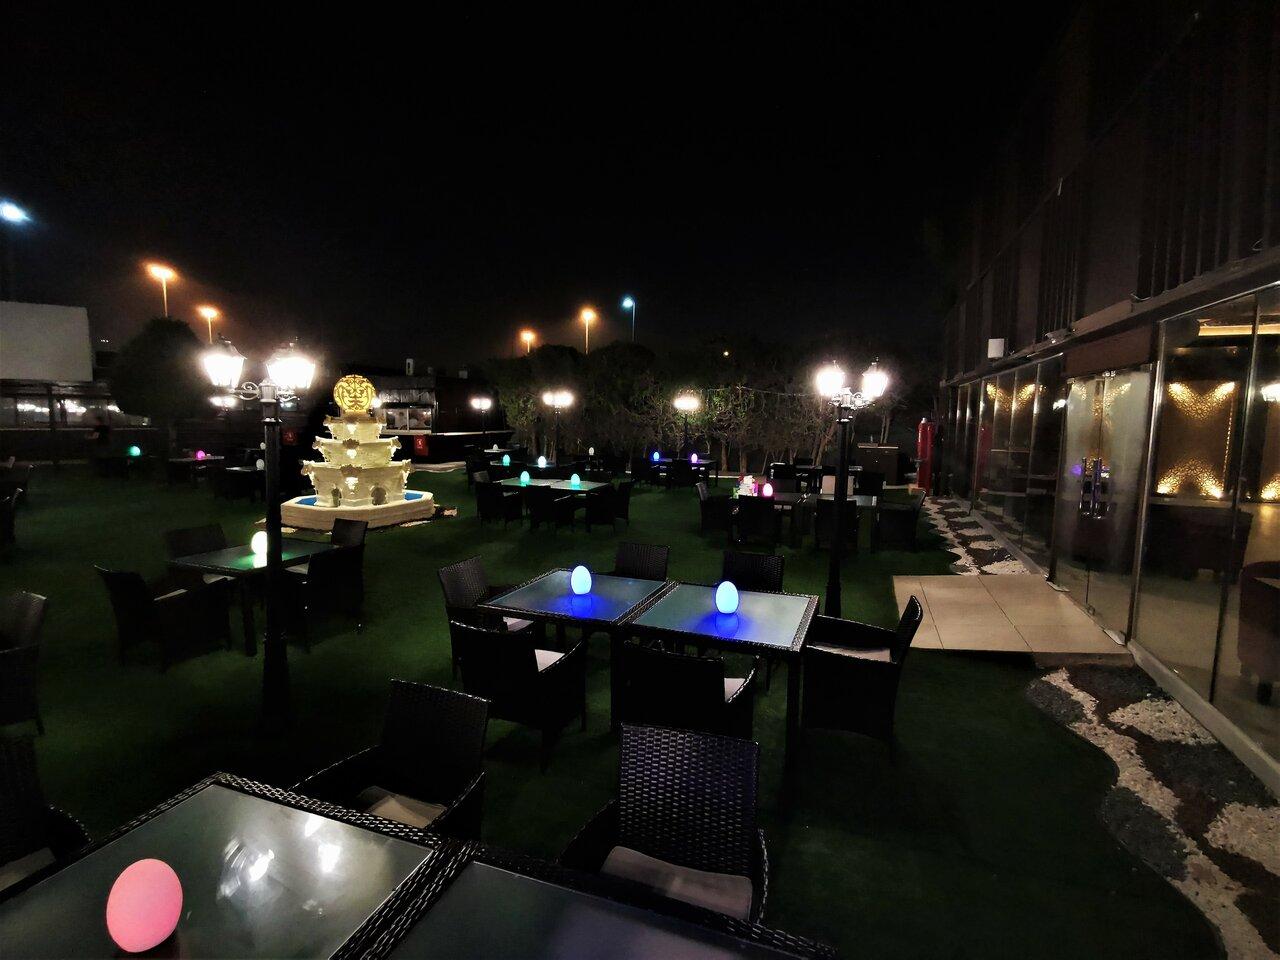 Villaggio Hotel Ex One To One -The Village